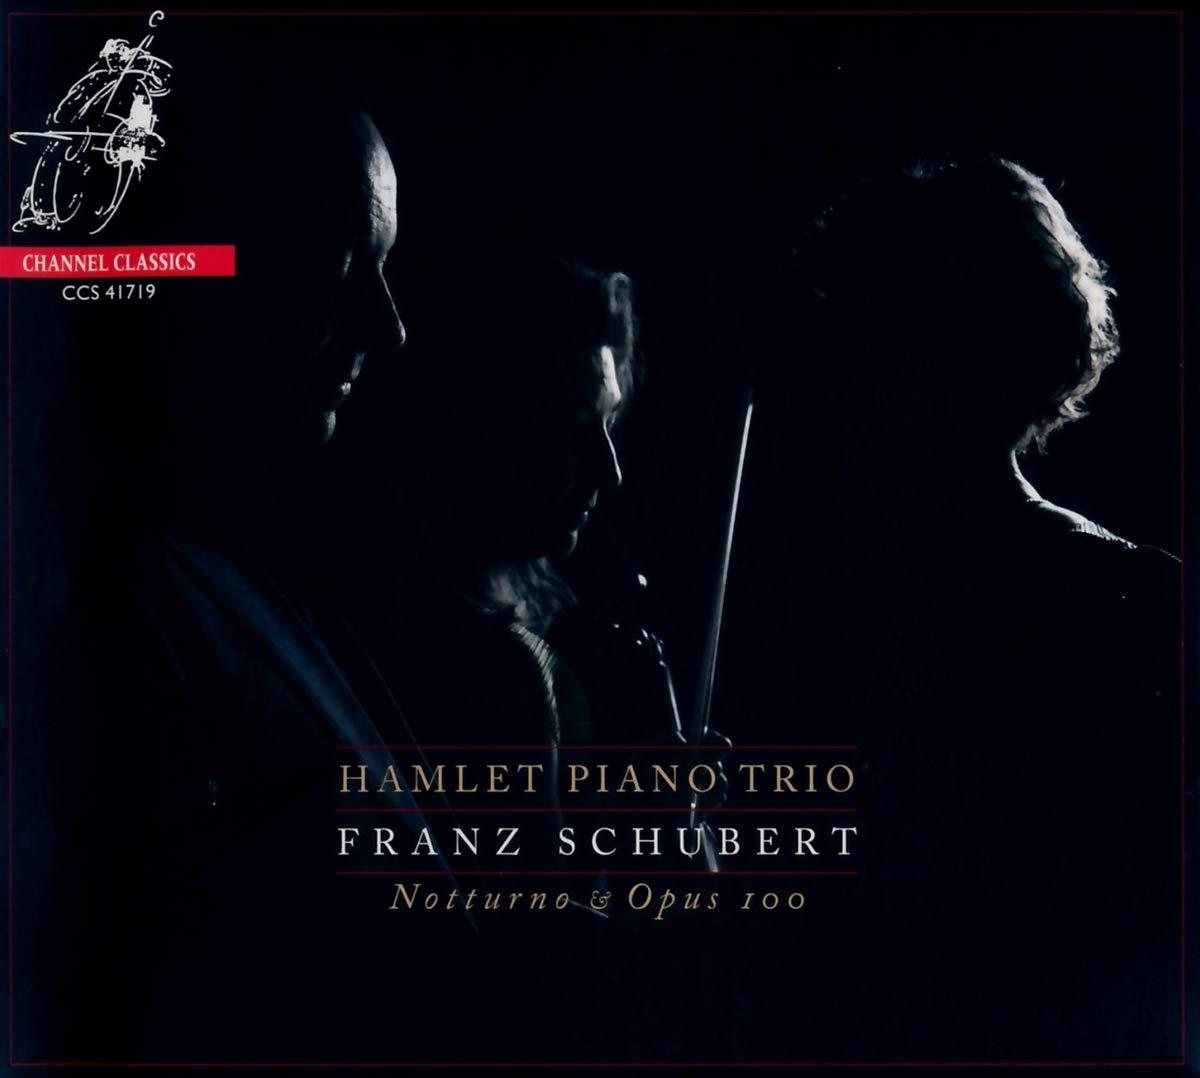 Hamlet Piano Trio <br>Franz Schubert Notturno & Opus 100